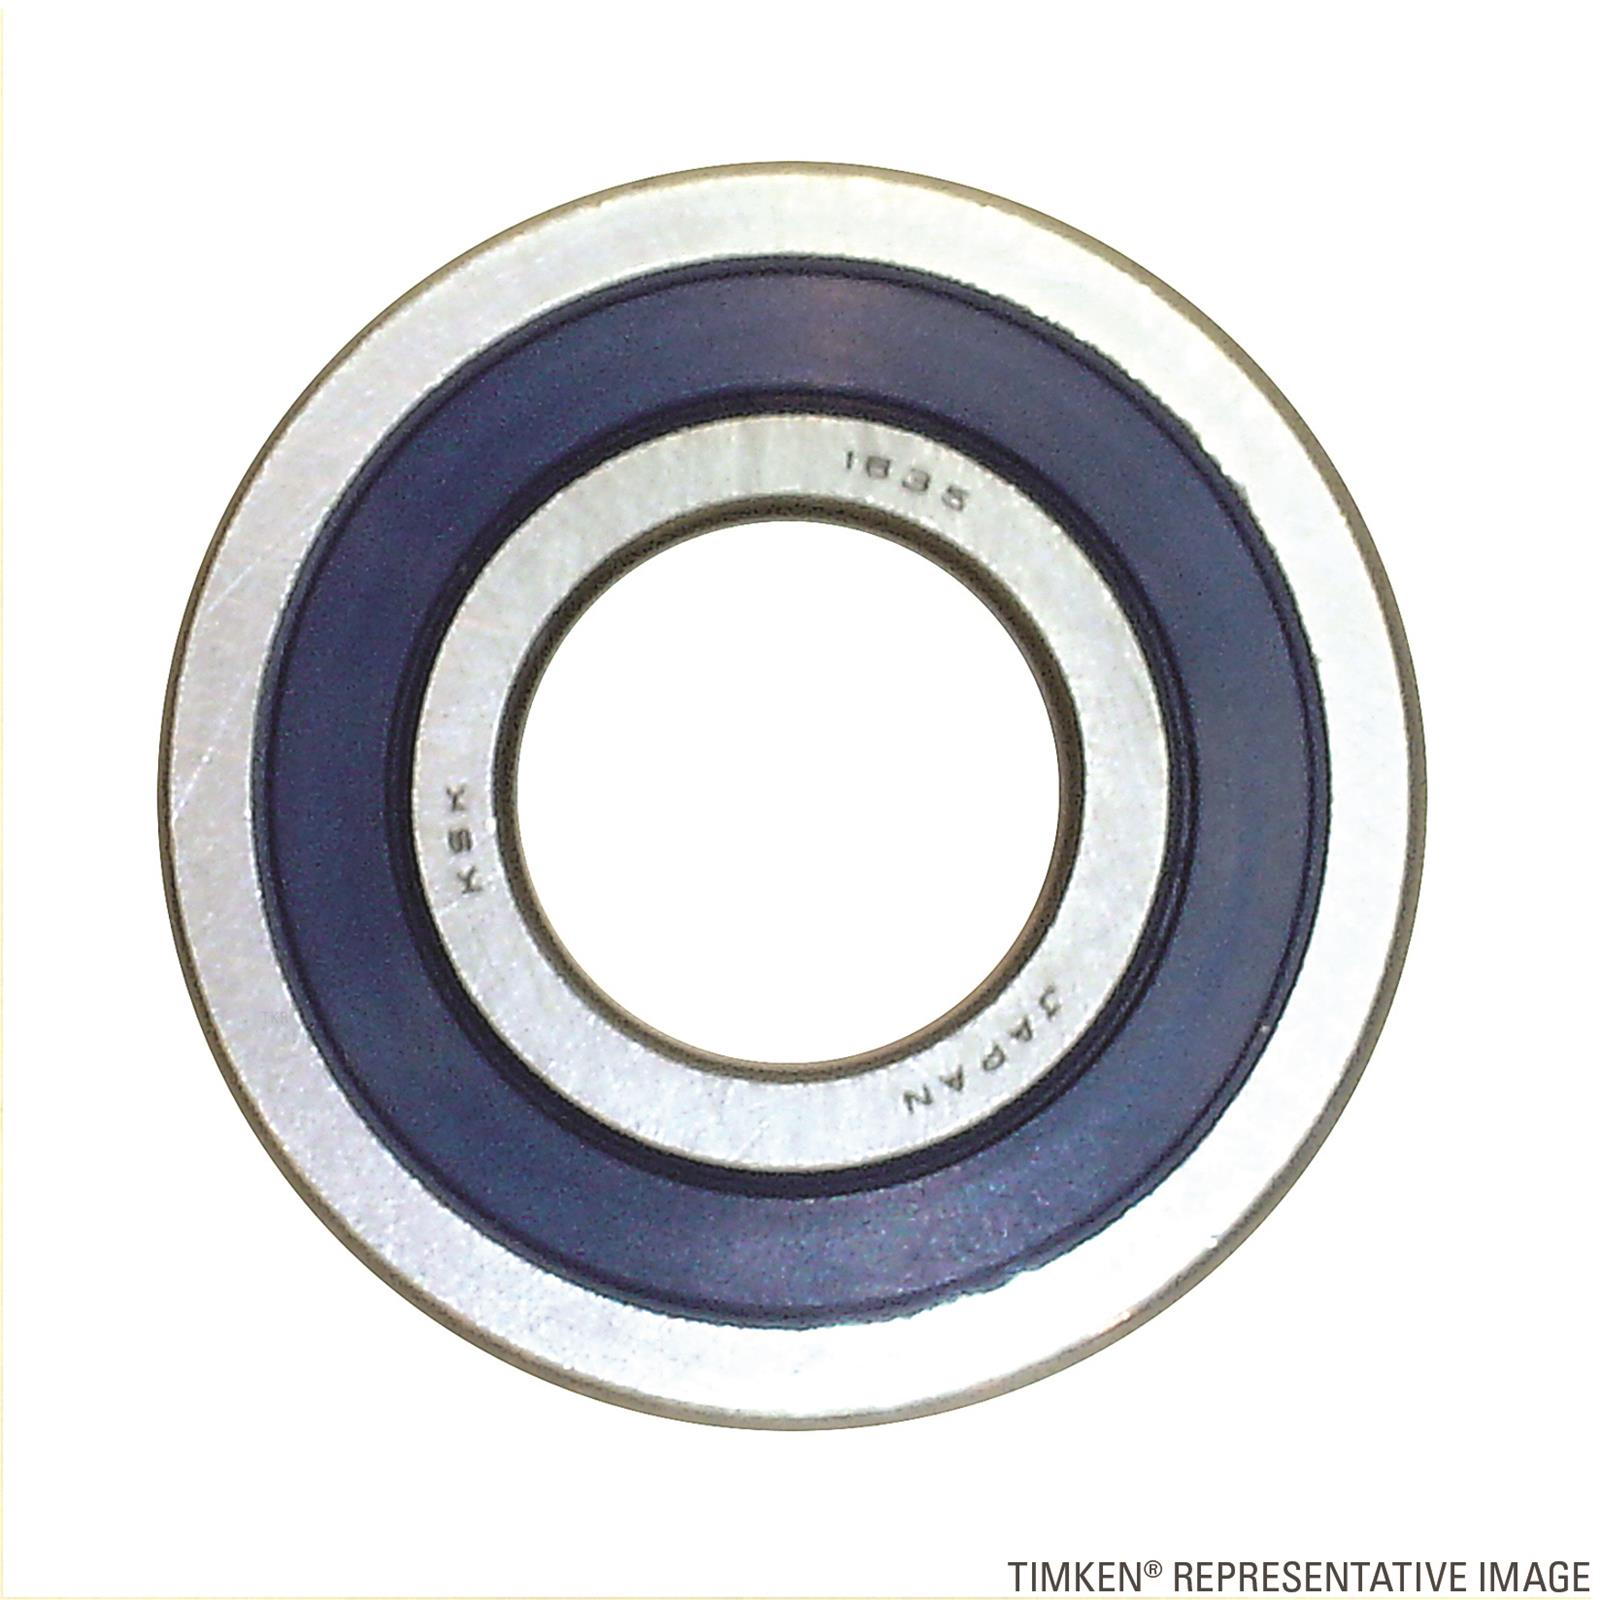 Timken 203FS Alternator Bearing